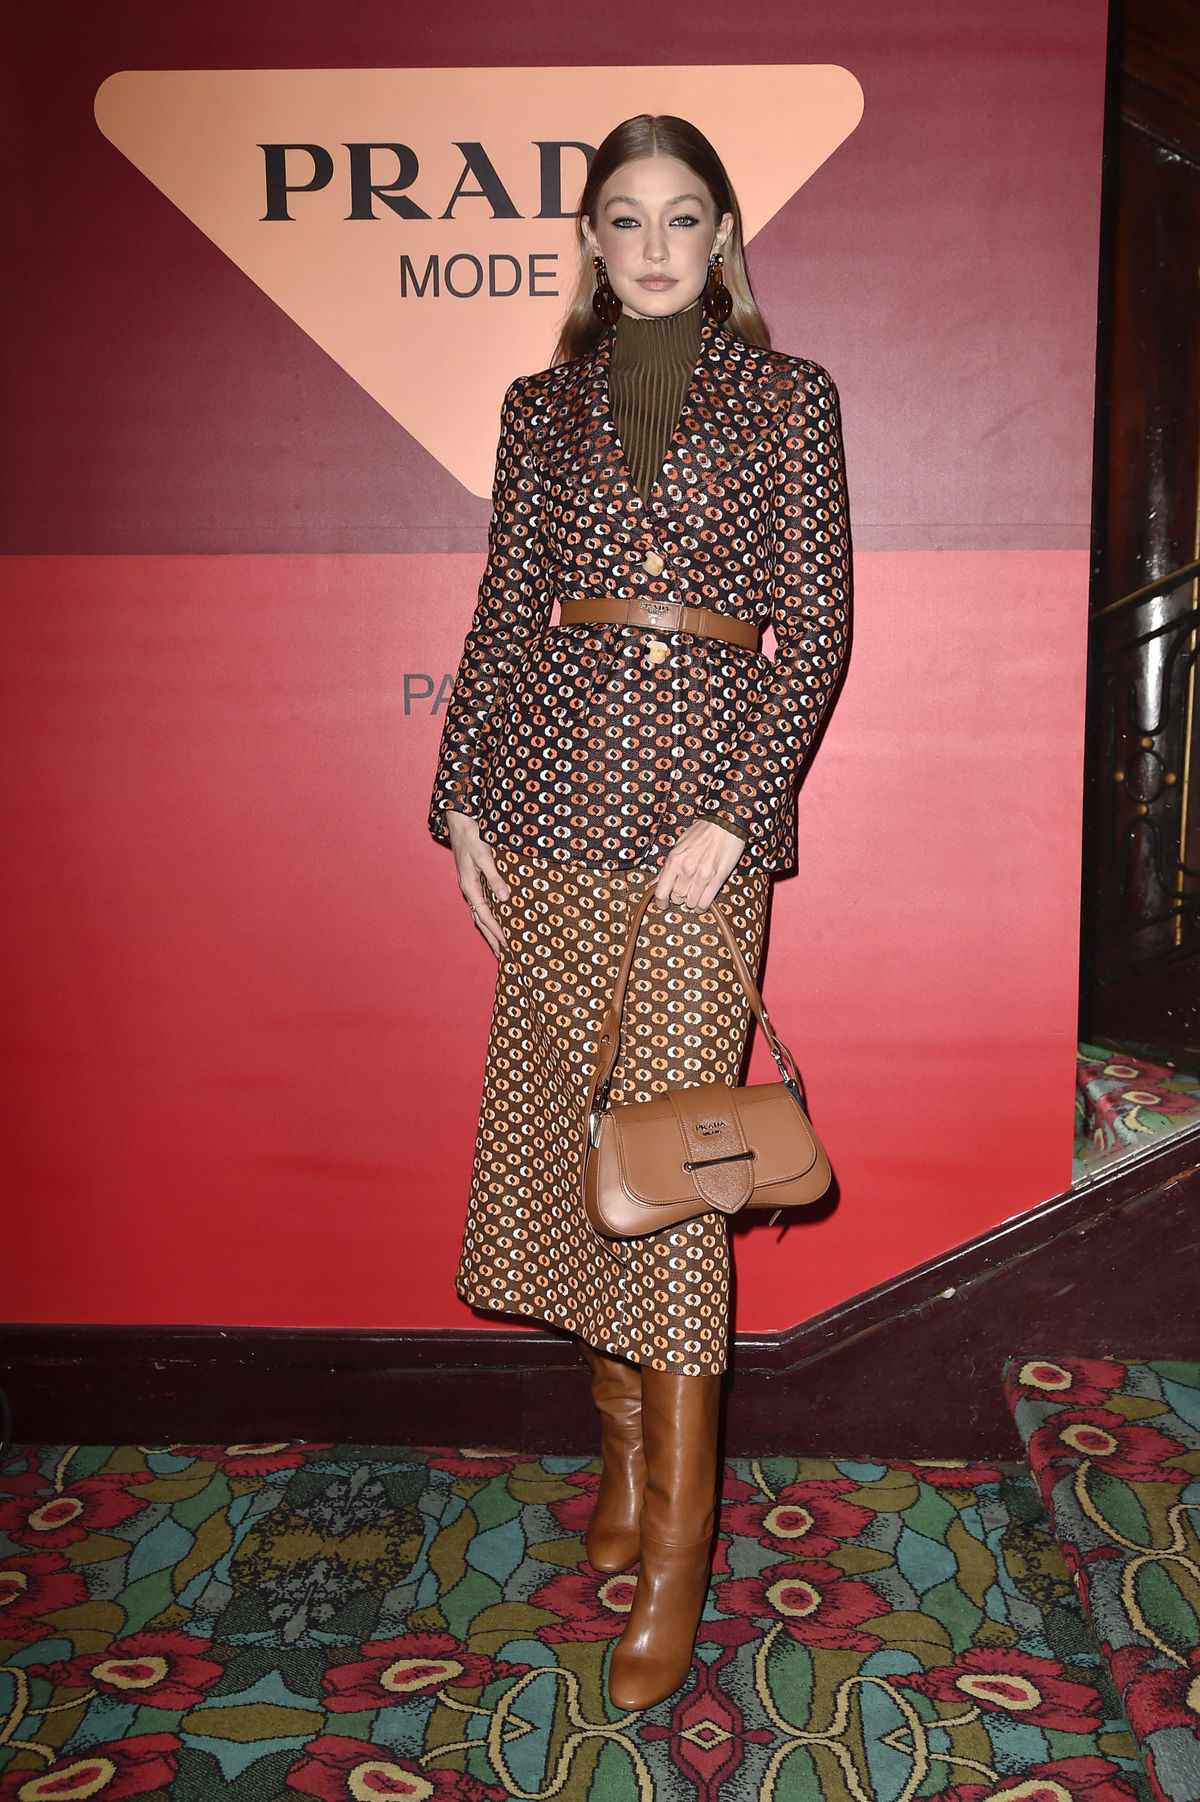 Topmodelka Gigi Hadid na akcii módnej značky...